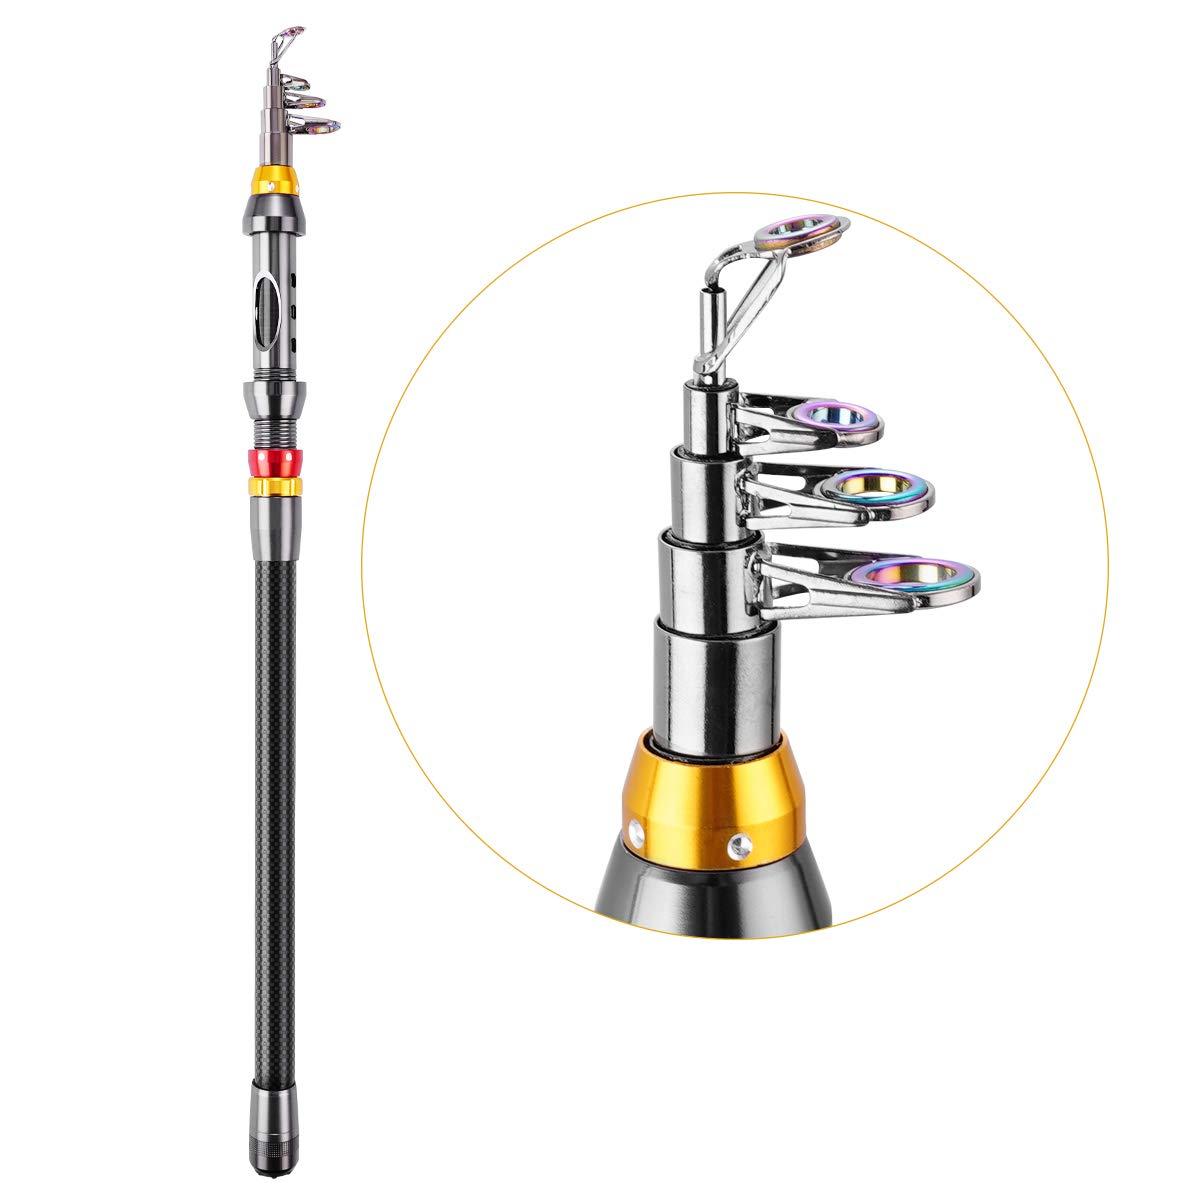 FishOaky Telescopic Fishing Rod, 2.1M Carbon Fiber Telescopic Spinning Fishing Pole for Saltwater & Freshwater | Kids & Adults | Boat, Surf, Lake